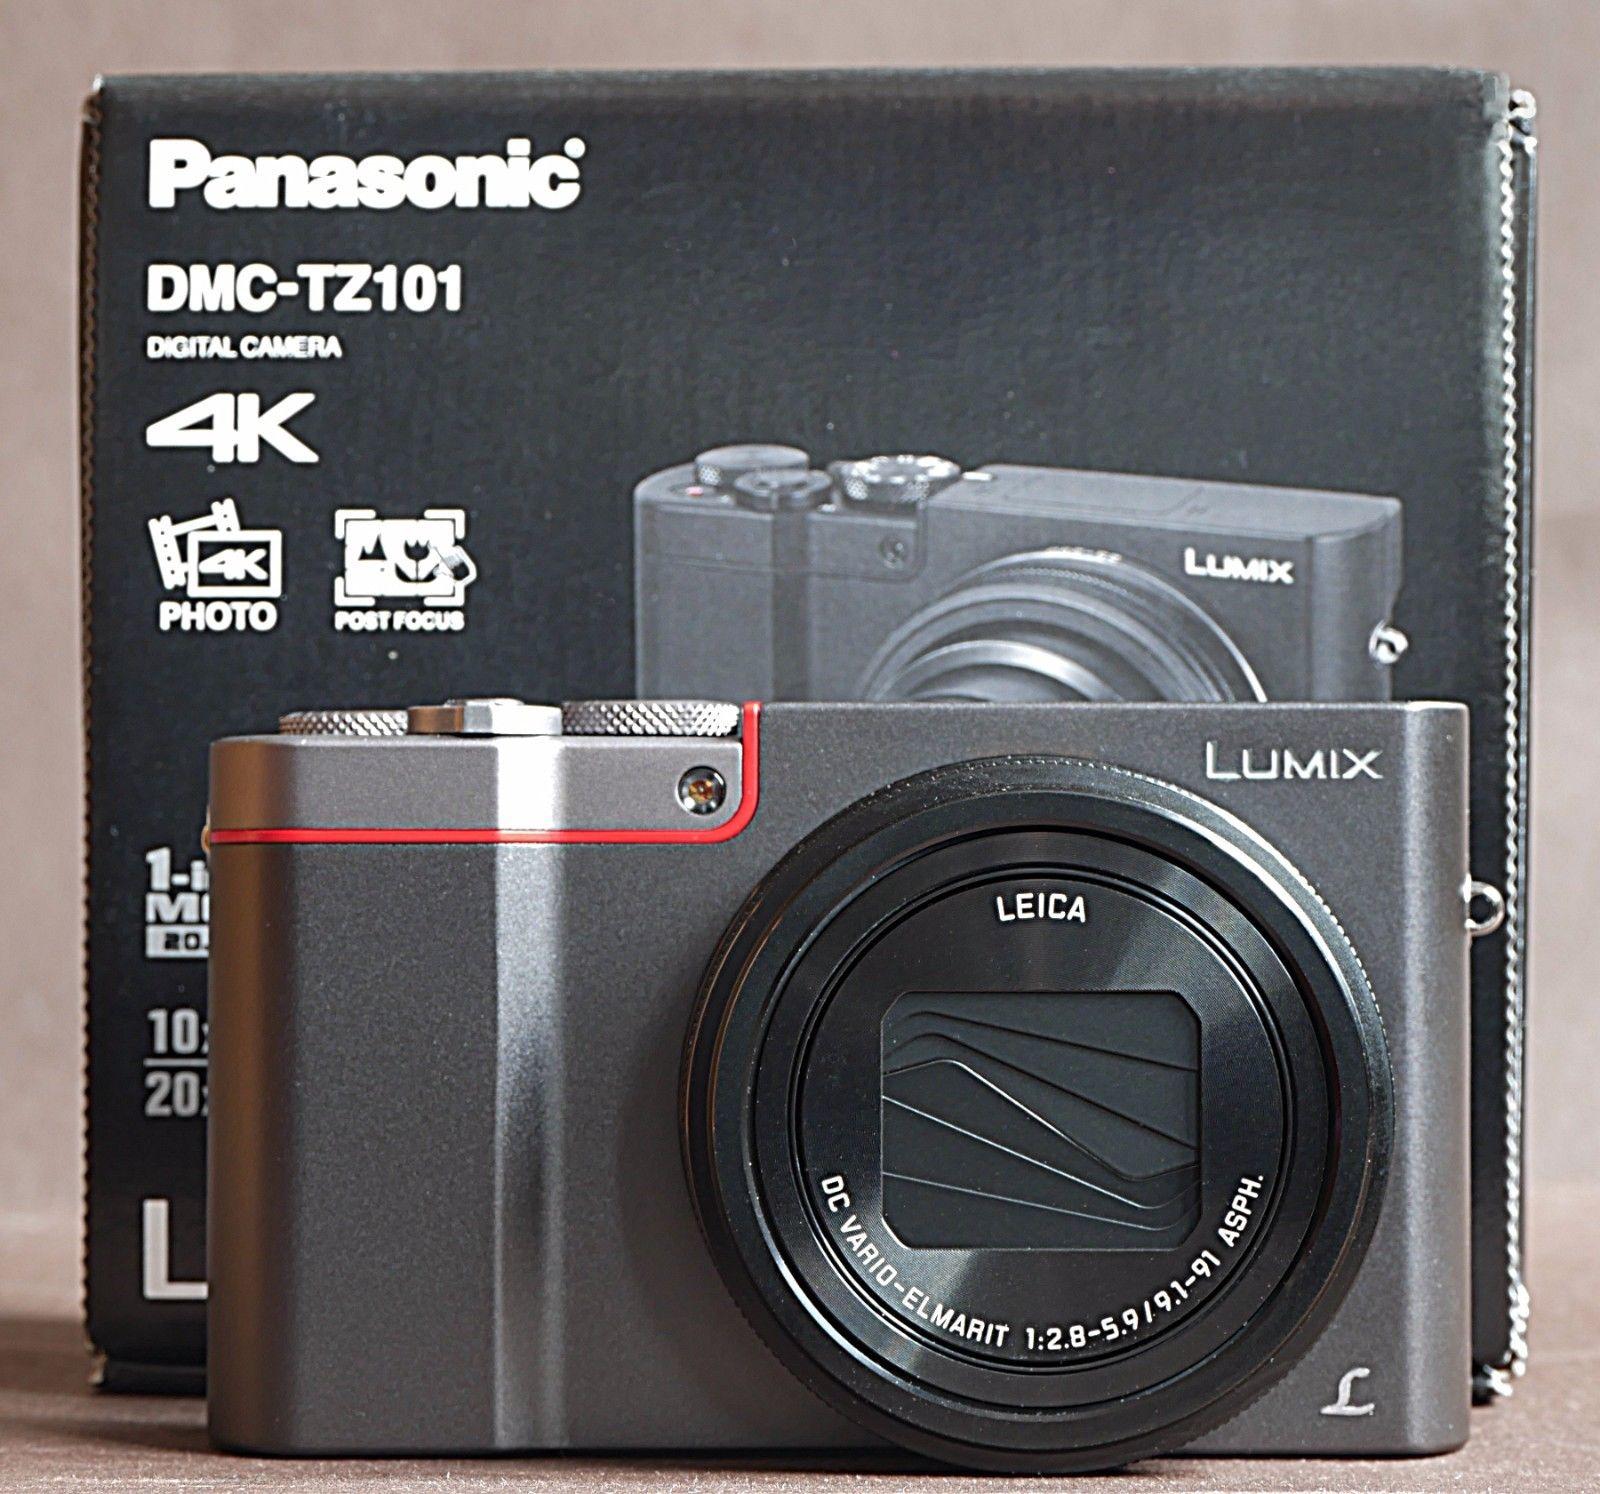 Panasonic DMC-TZ101 EGS, Digitalkamera, silber, Ovp. wie neu,nur 480 Auslösungen